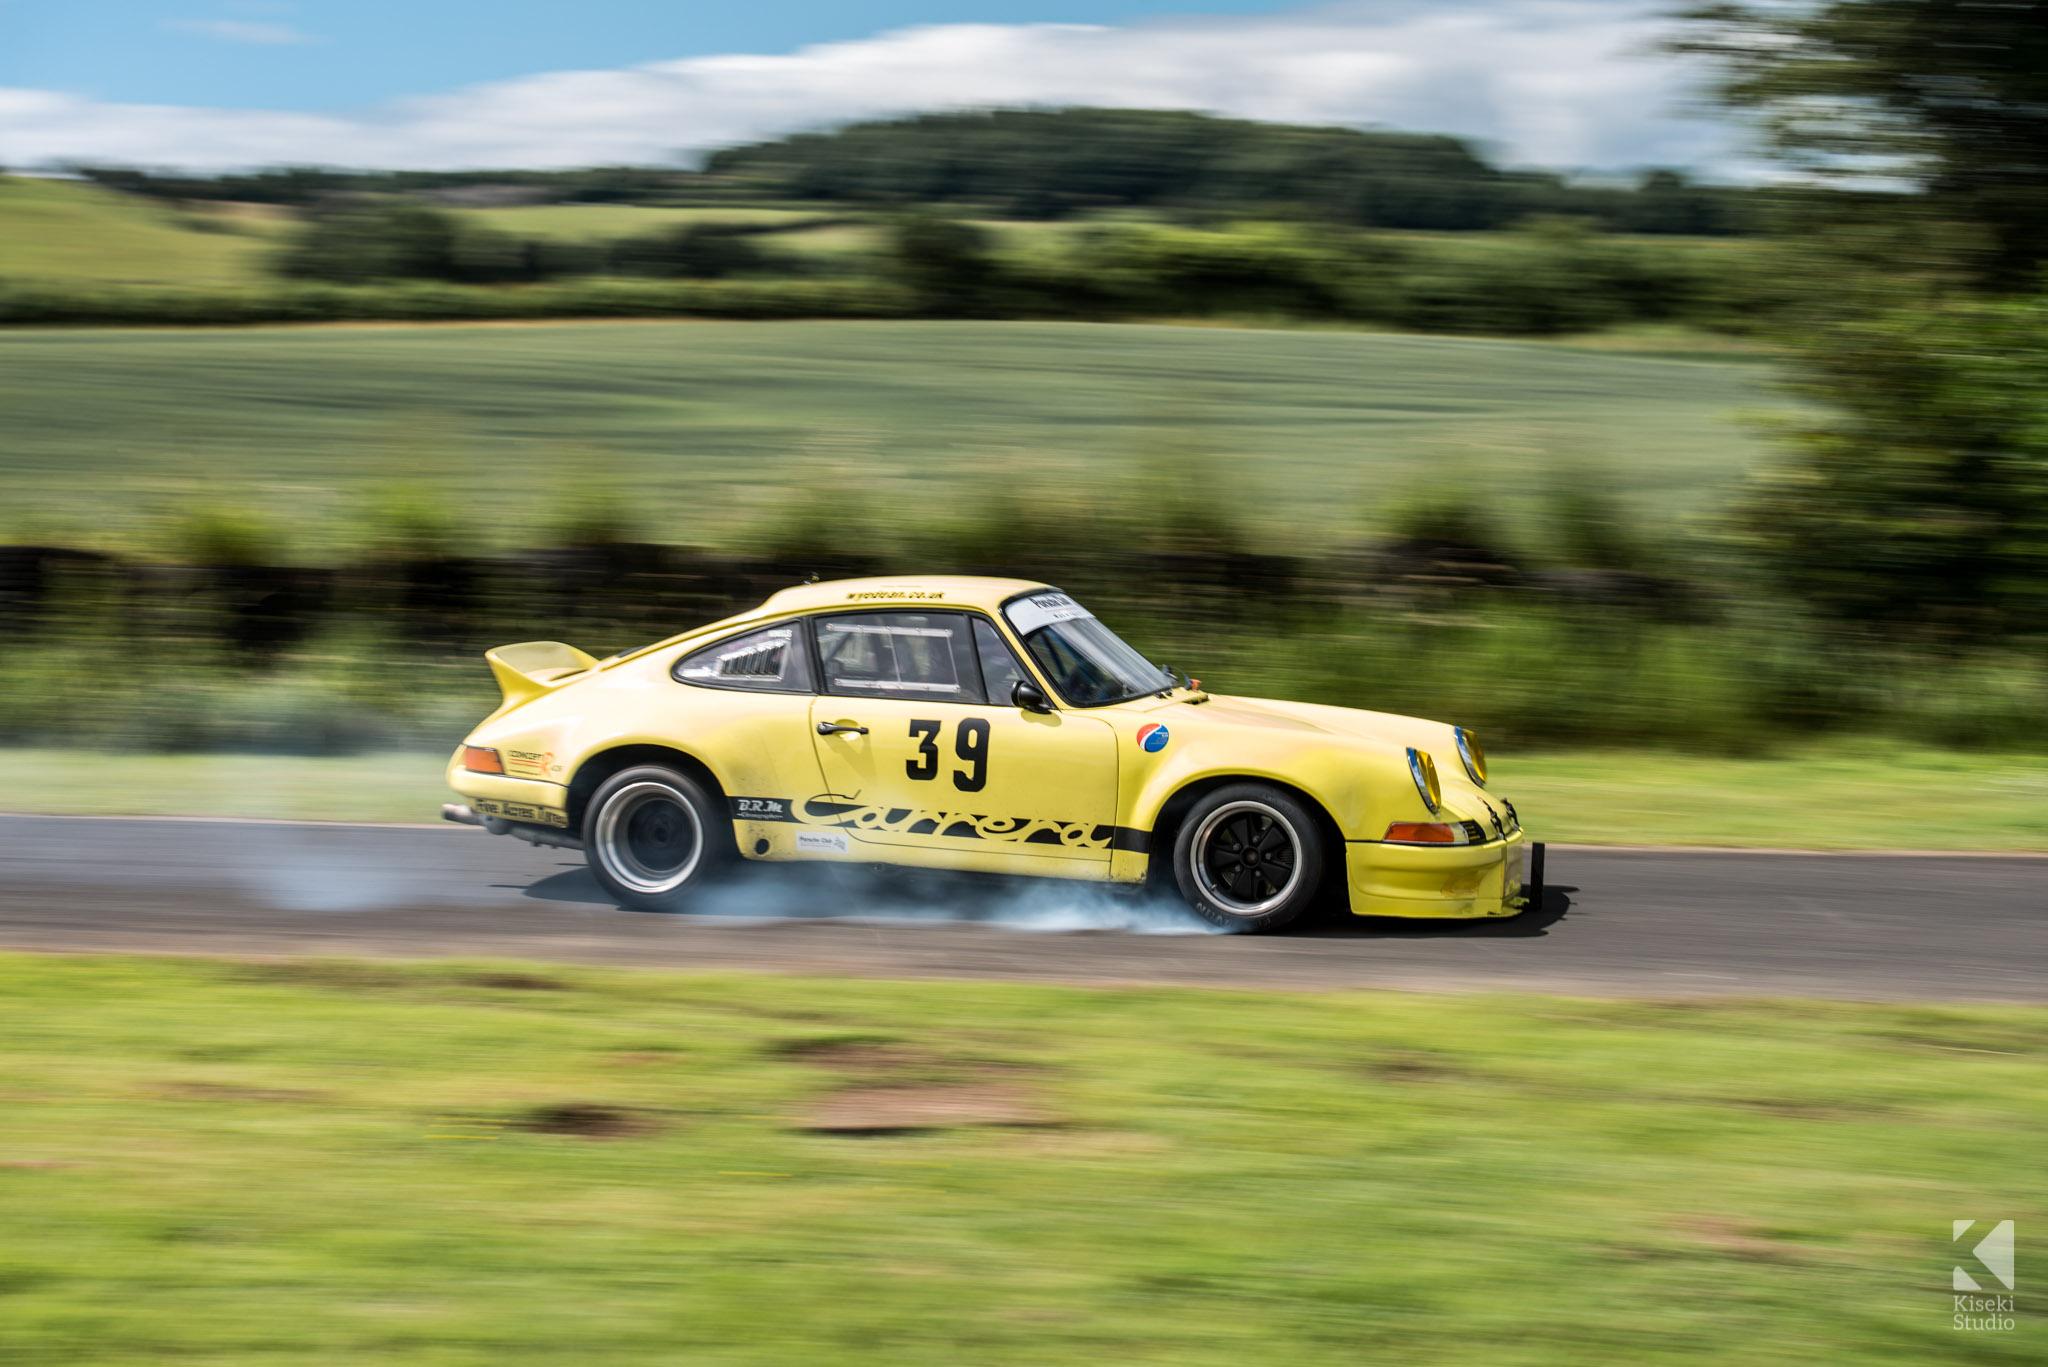 porsche-911-carrera-rs-930-harewood-speed-hillclimb-braking-locked-up